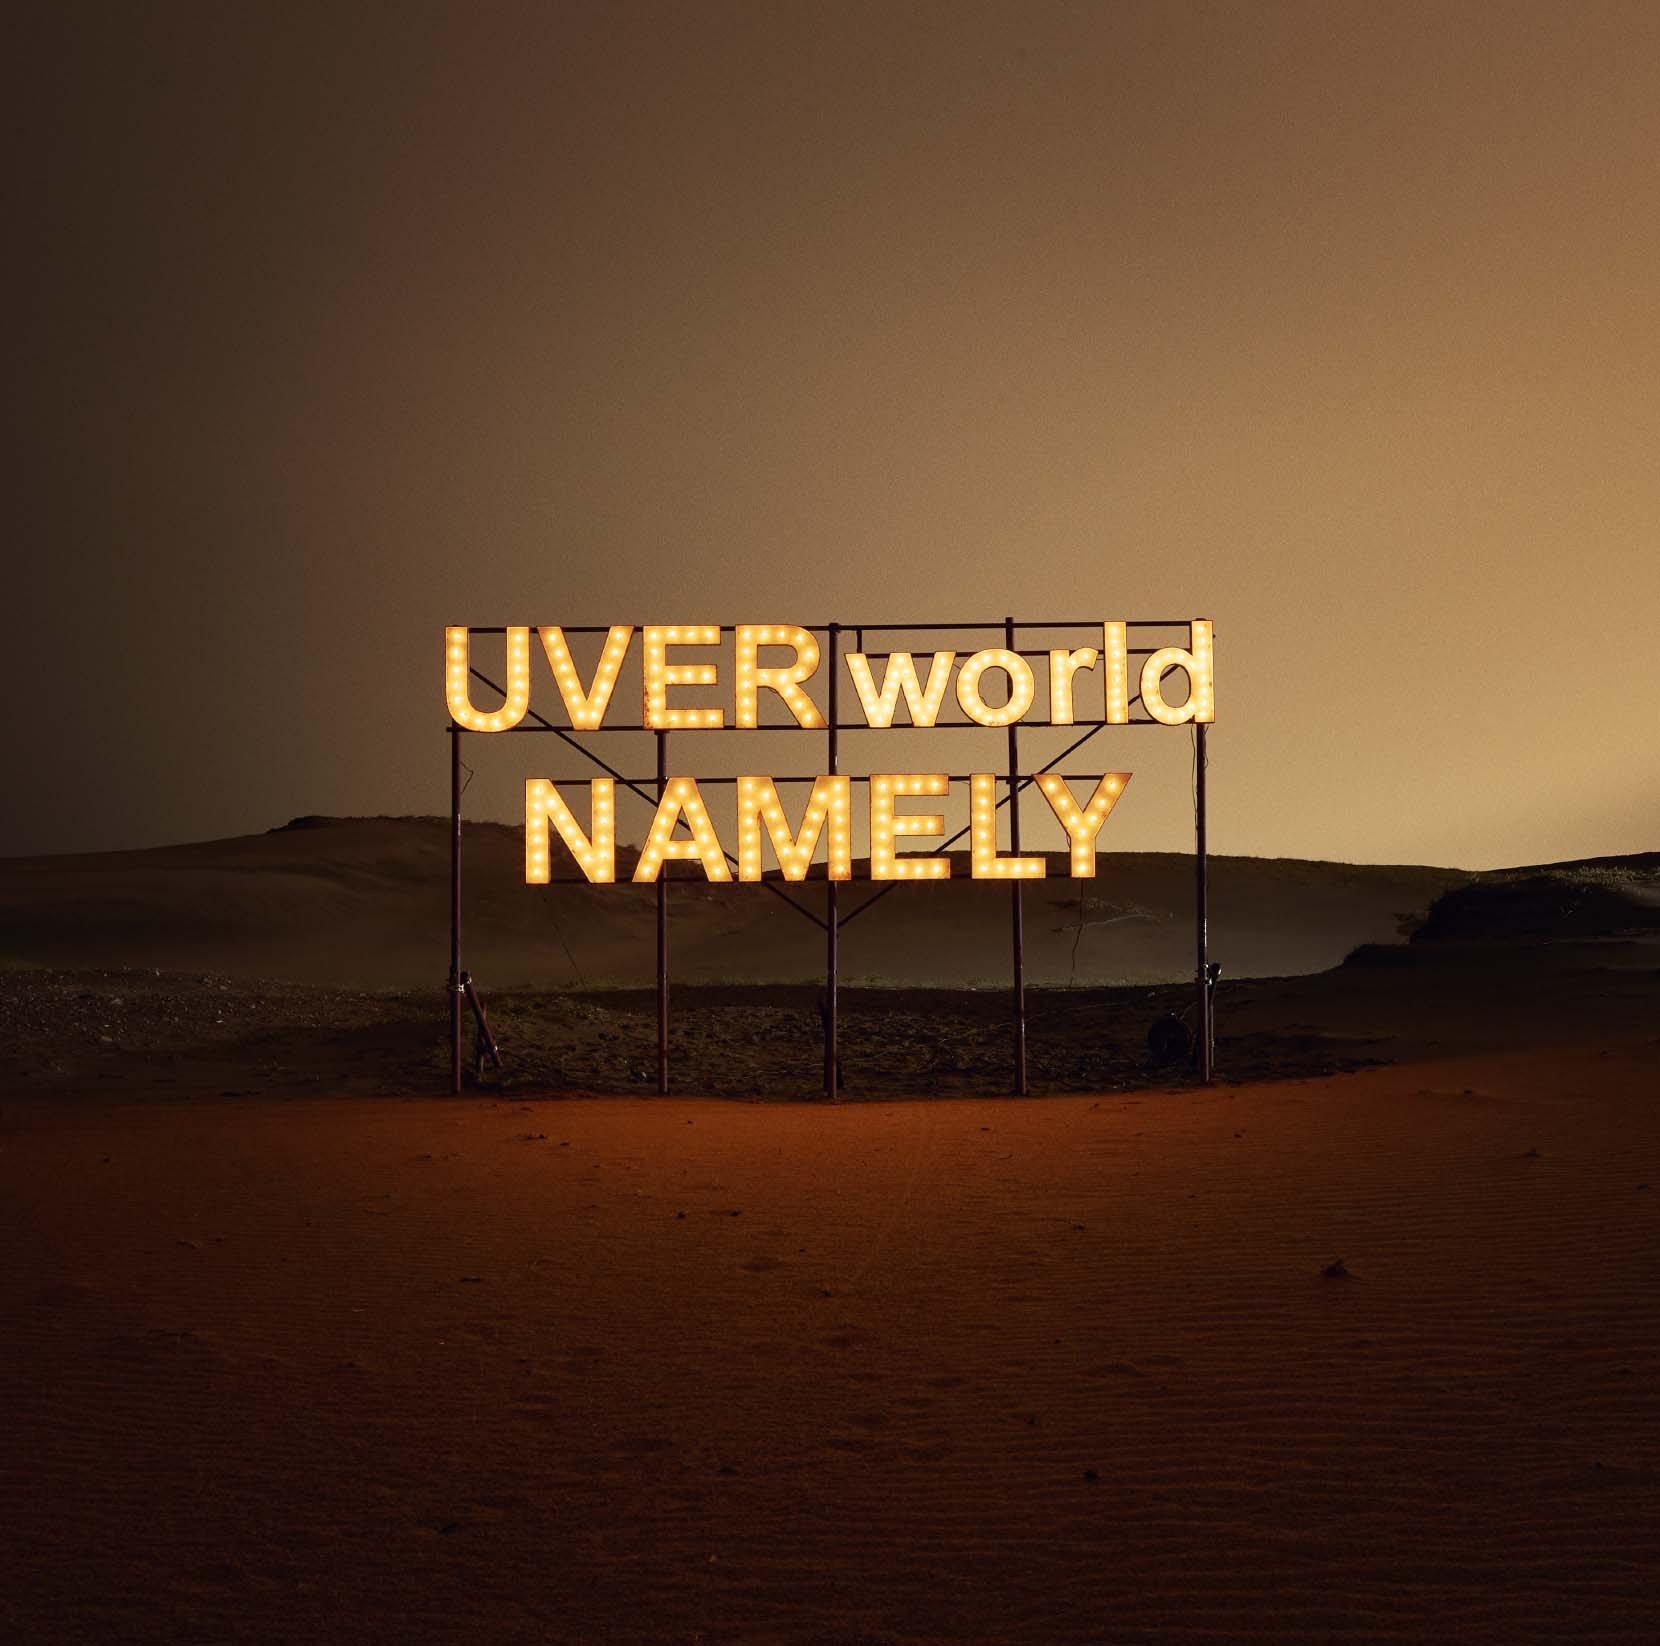 UVERworld - NAMELY